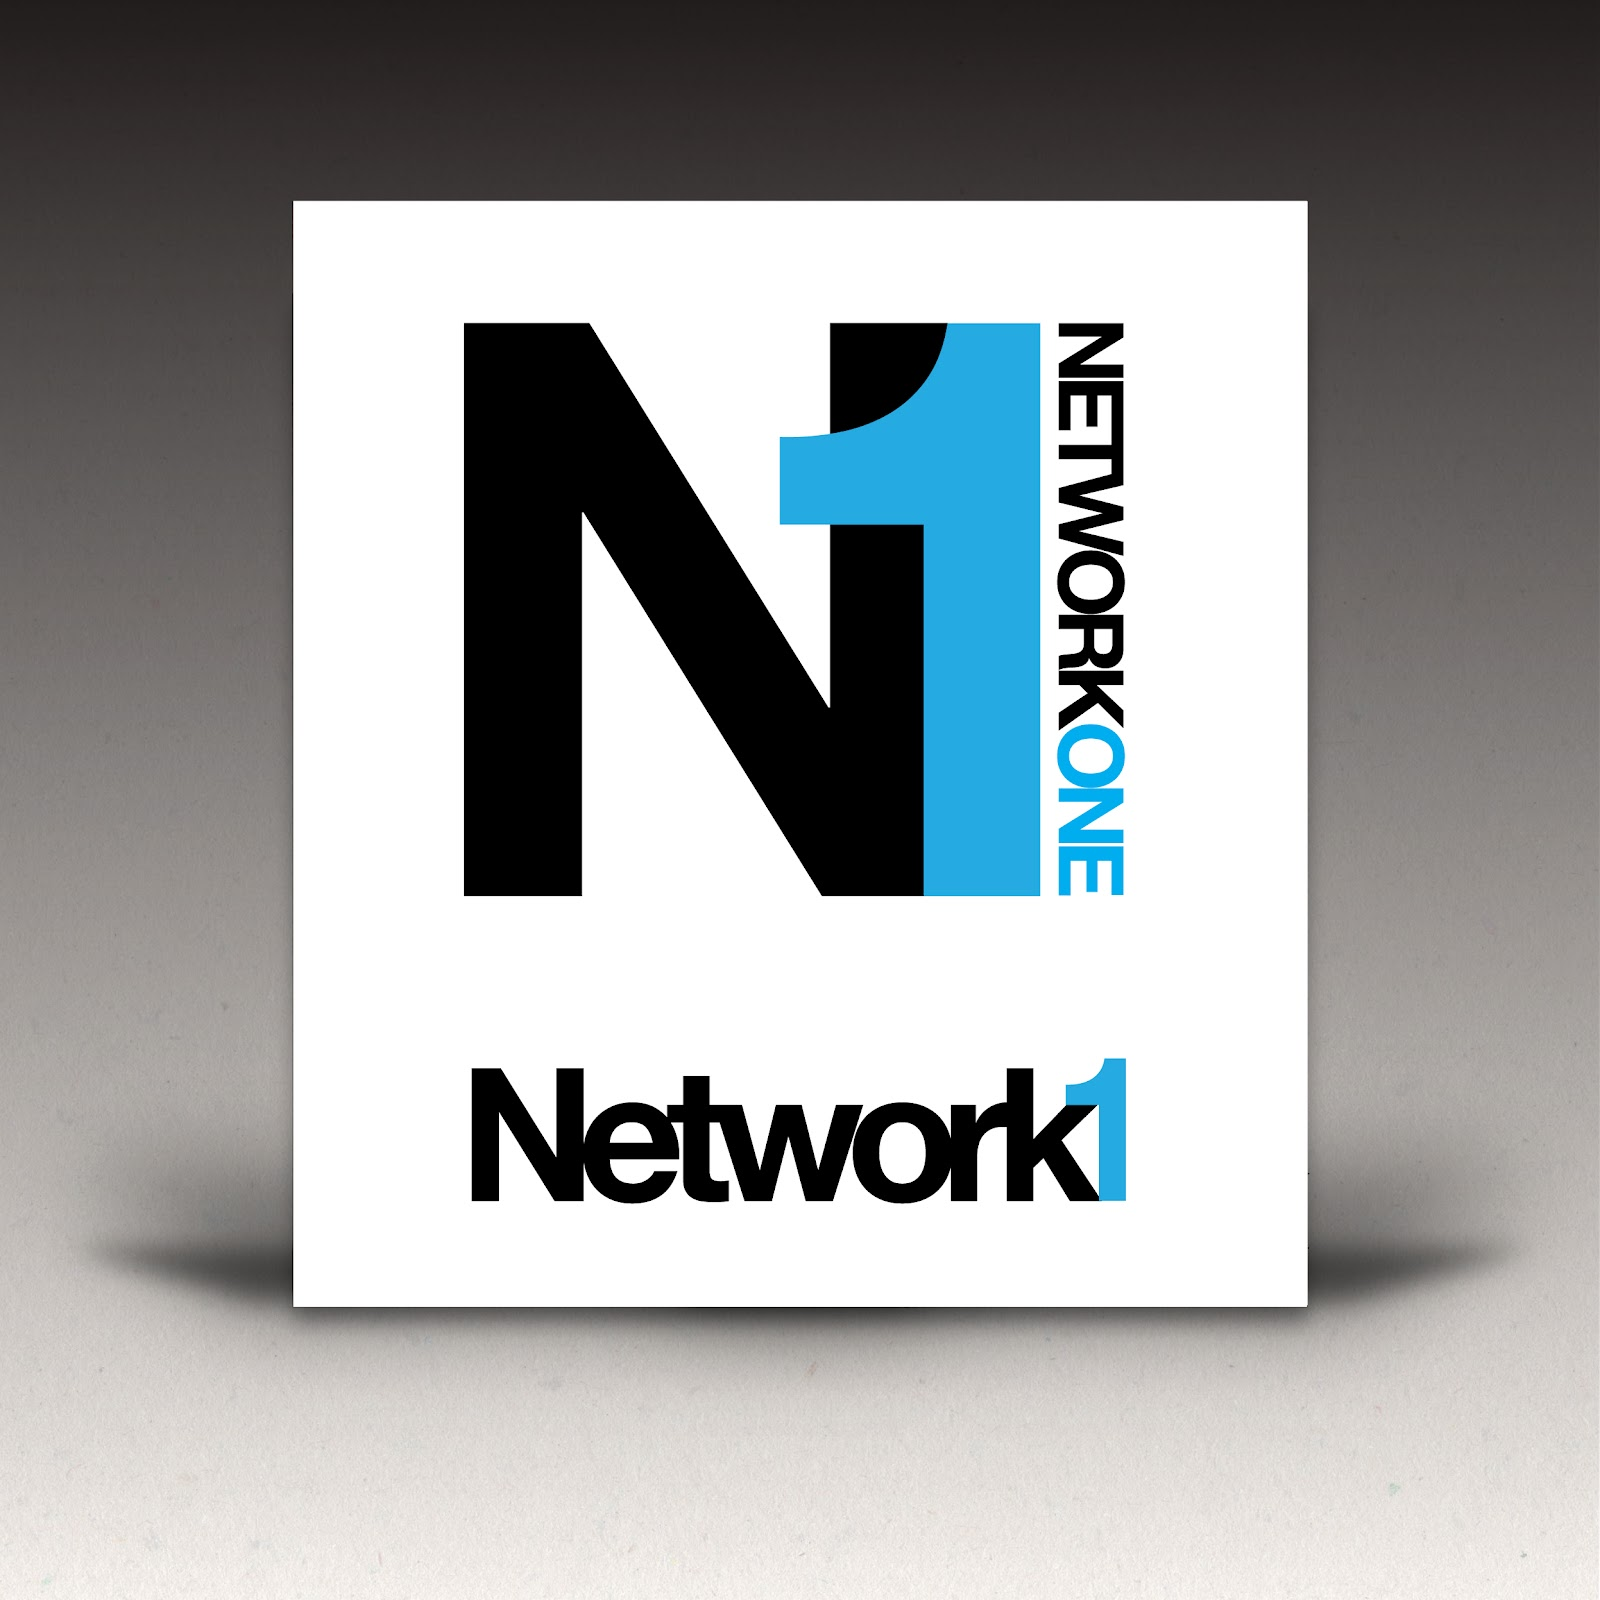 Pin Logos Famous...N Company Logos